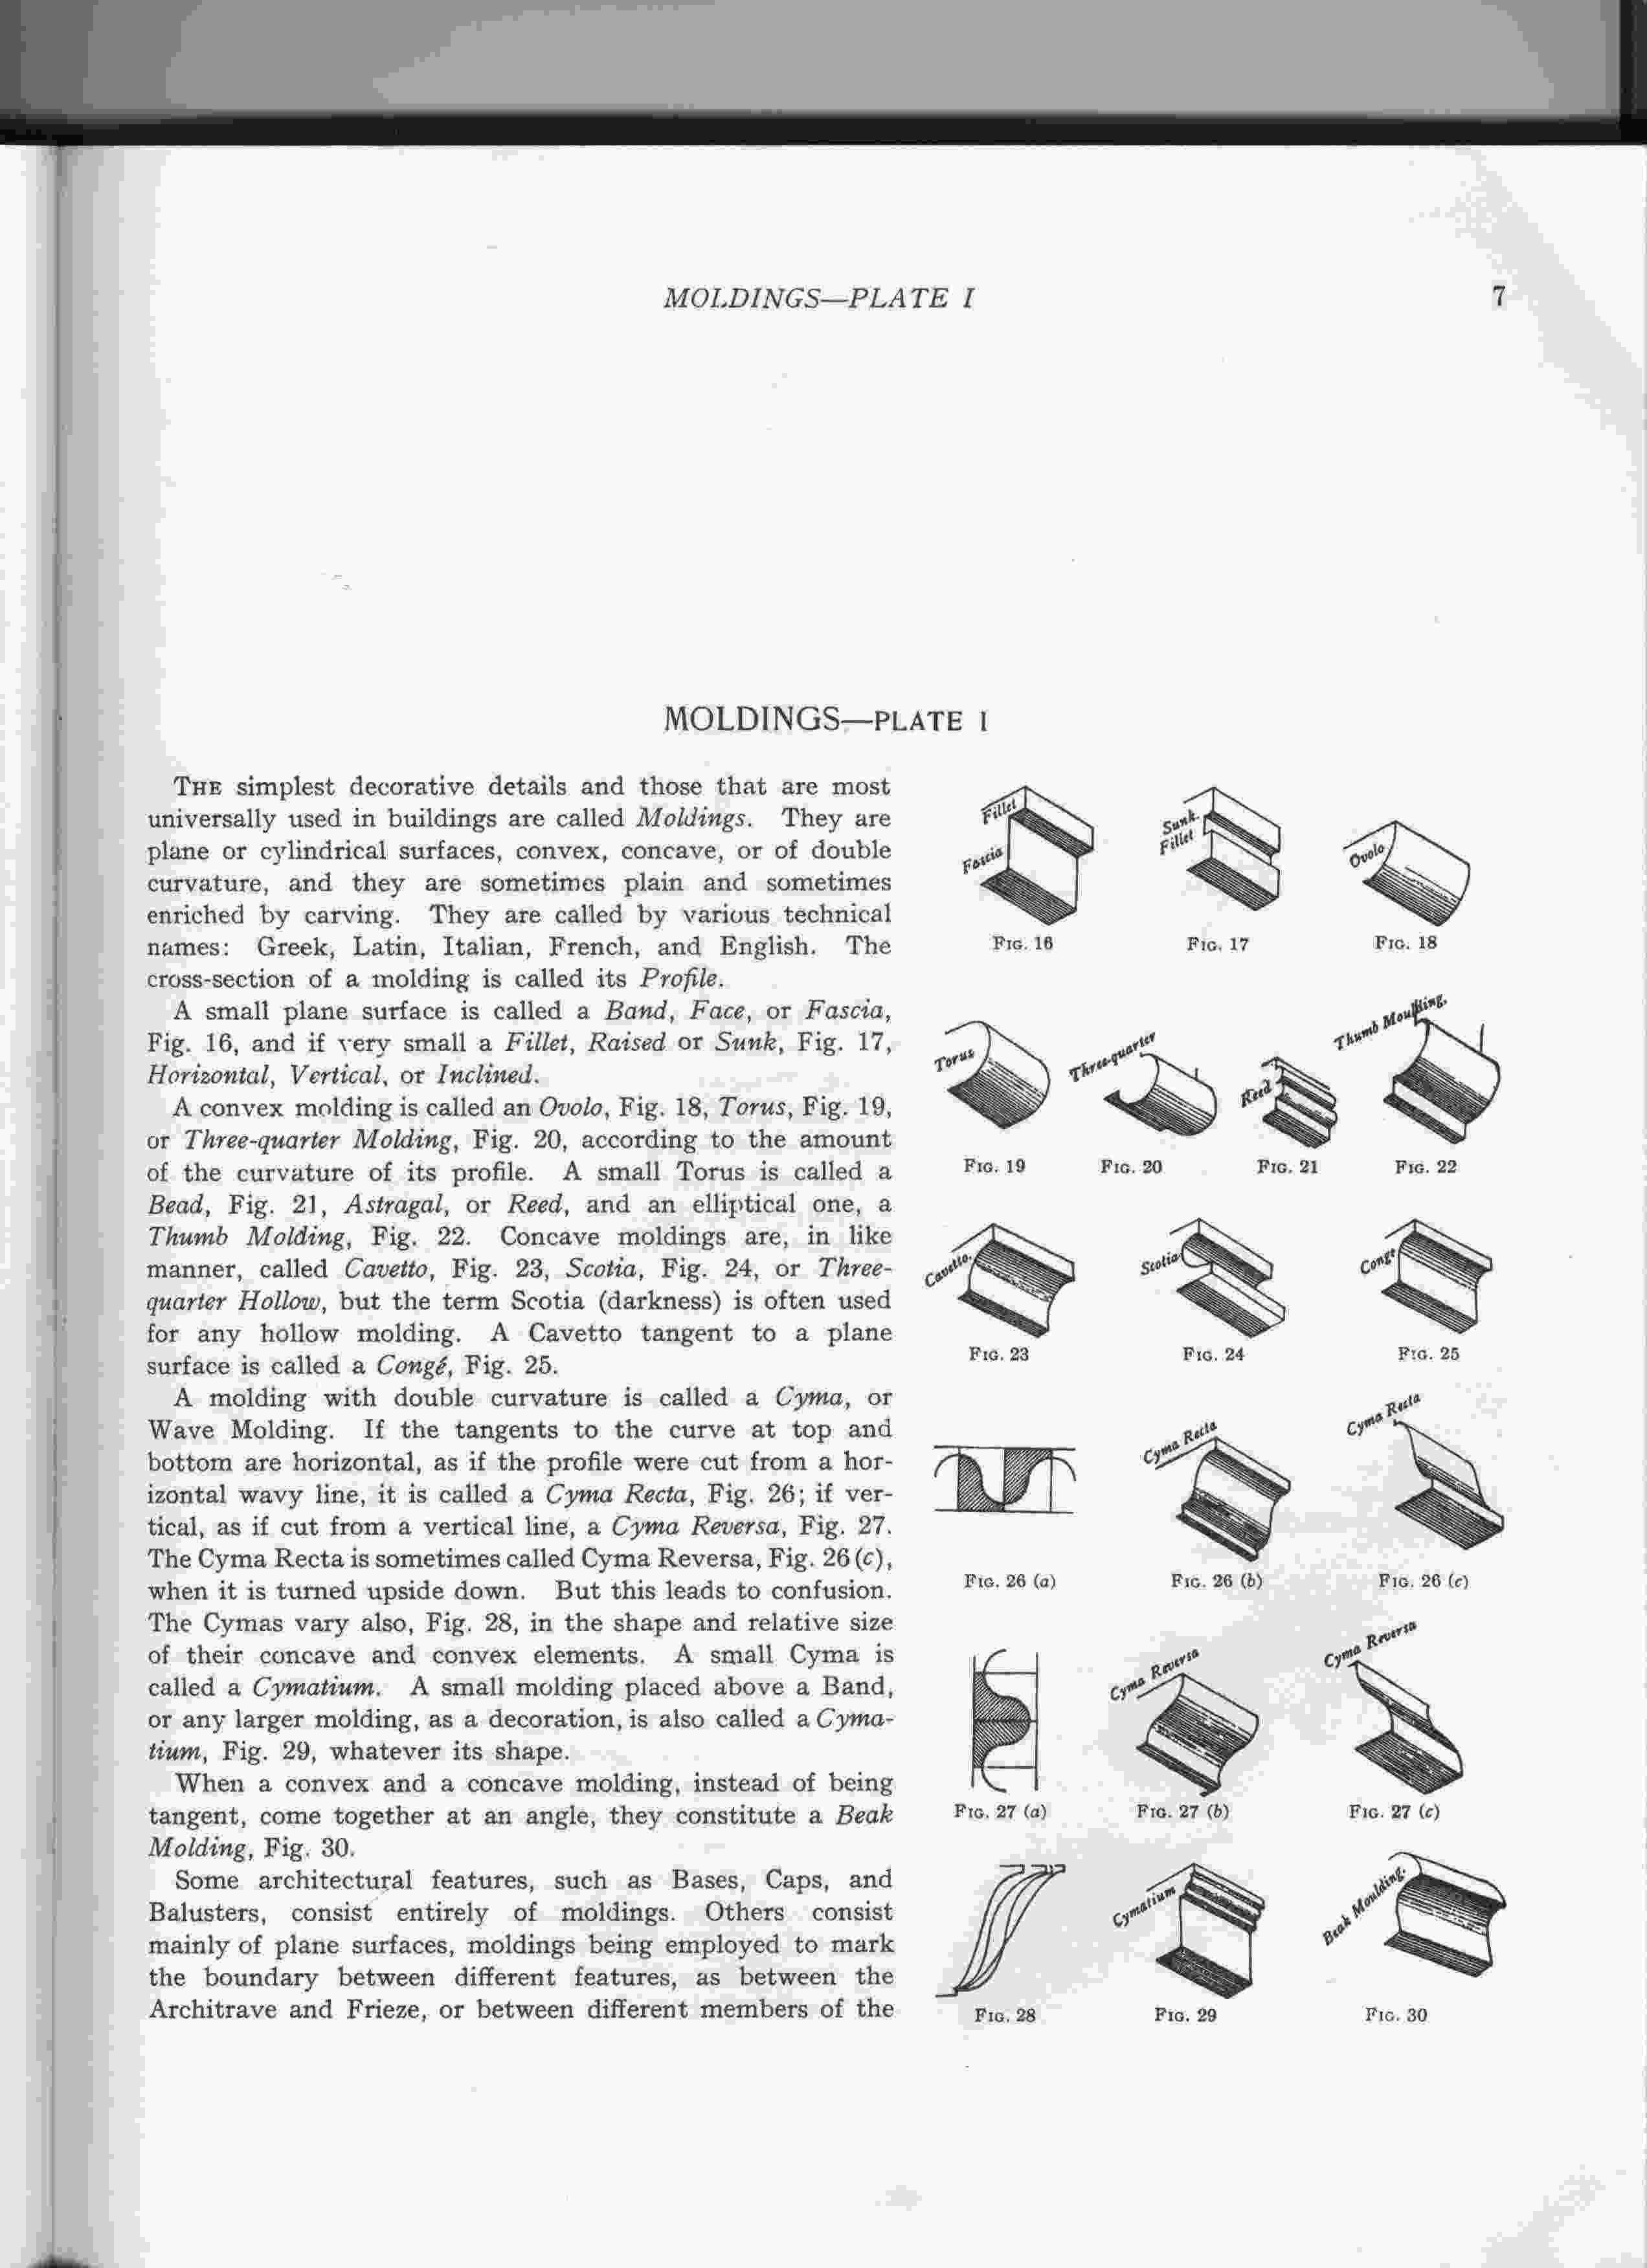 By Brians Request, Mantel, Over Mantel-american-vignola-page-7.jpg